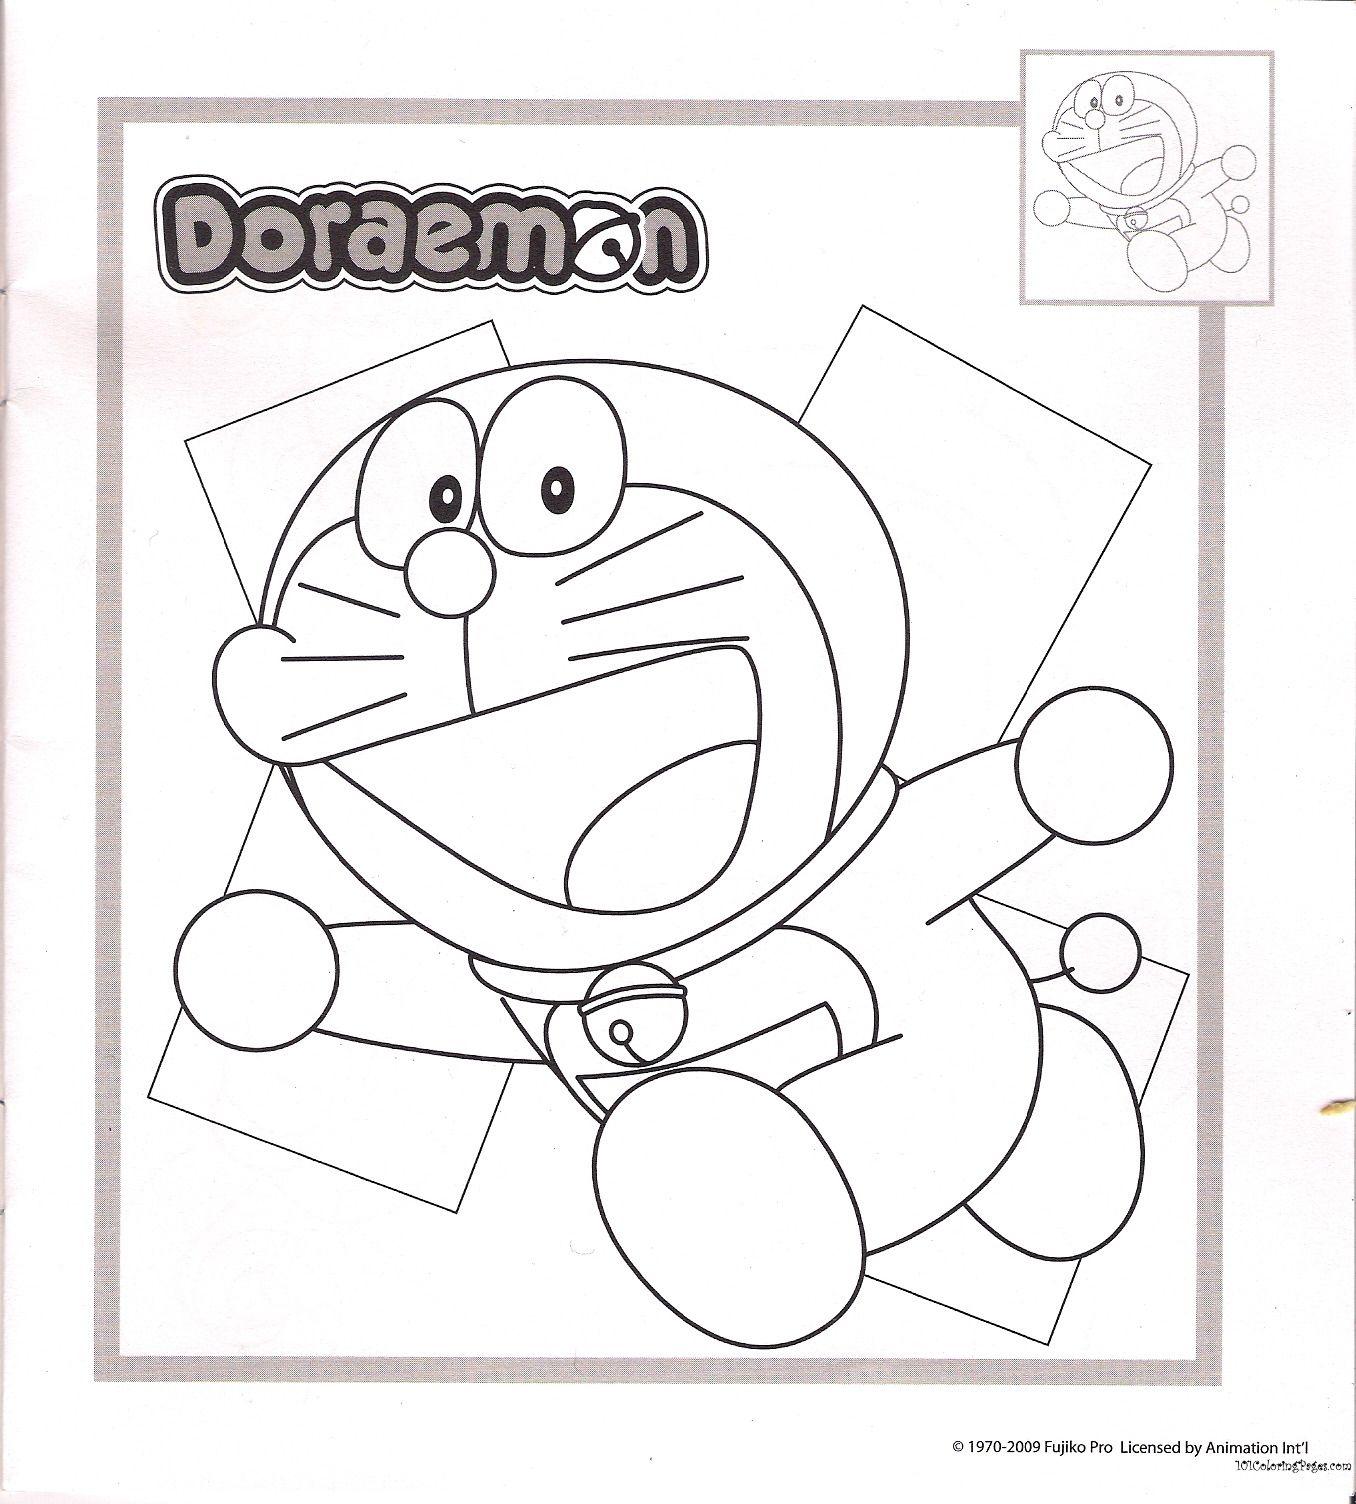 doraemon coloring pages | 2016 new stuff | Pinterest | Media storage